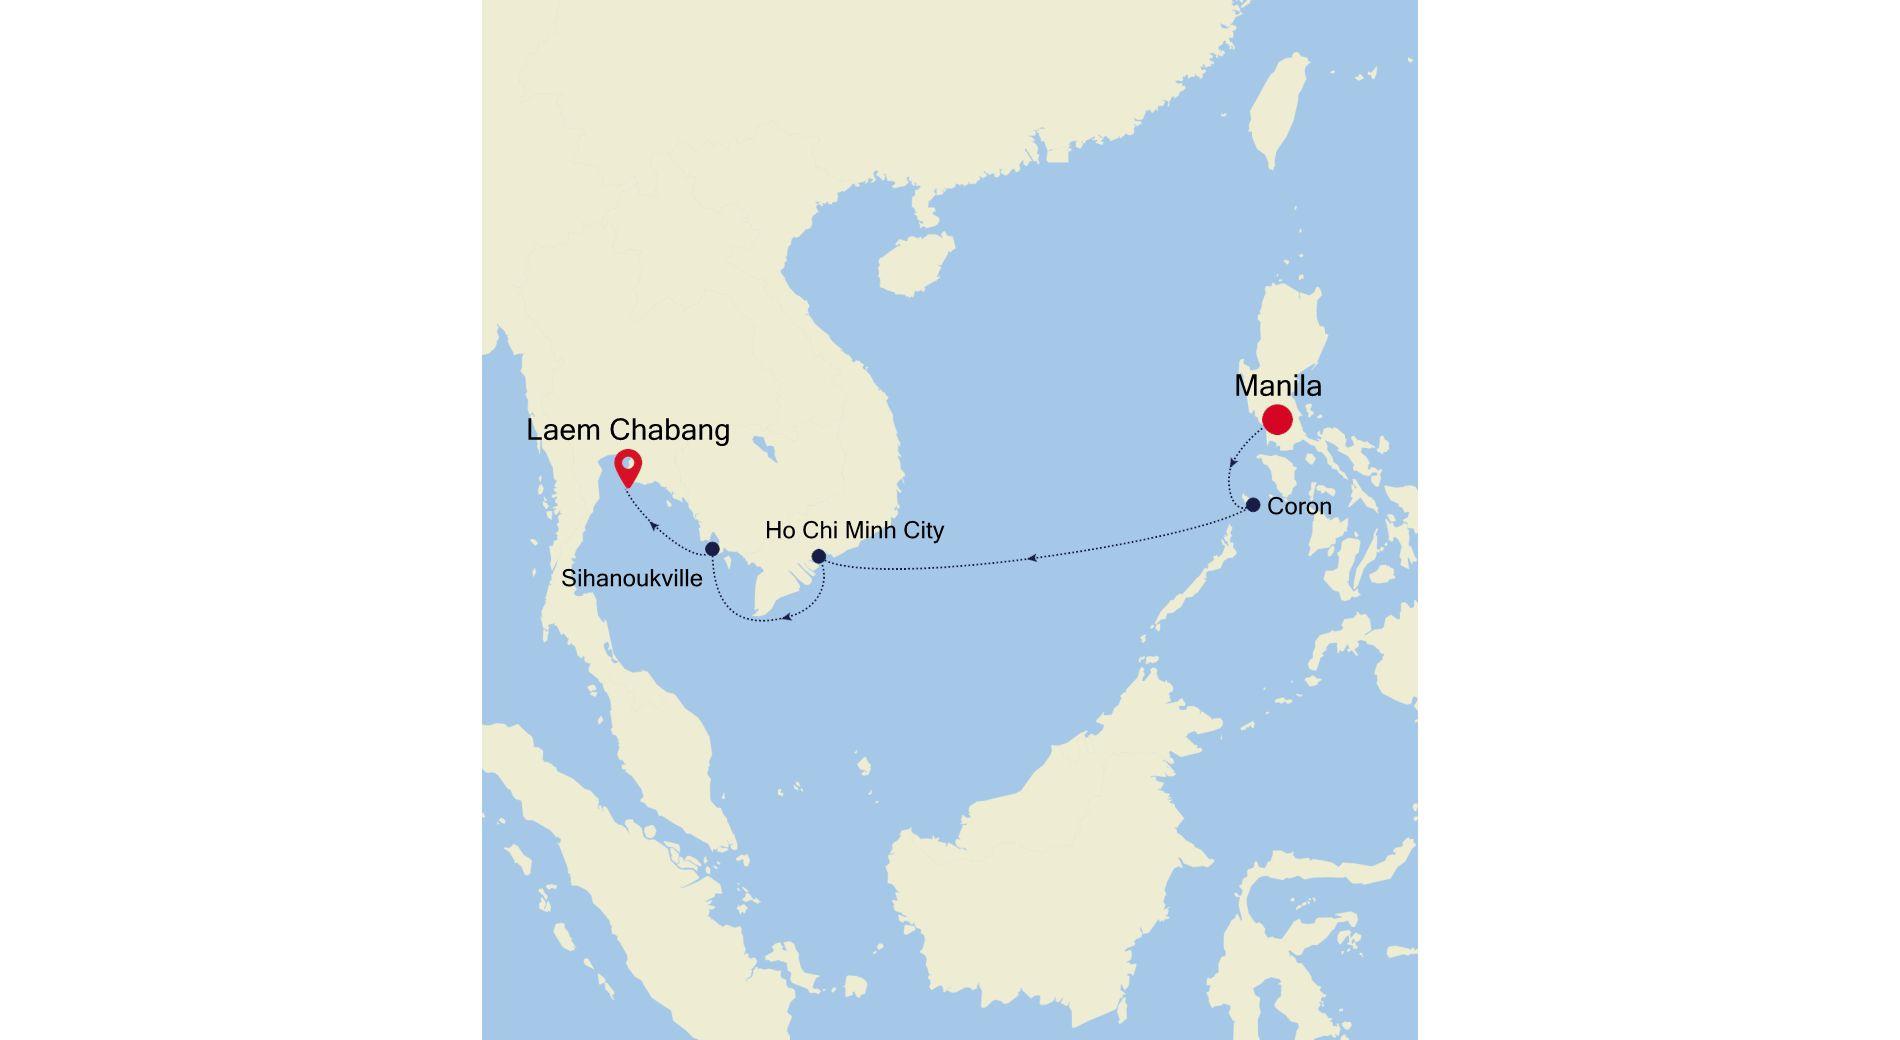 5002B - Manila to Laem Chabang